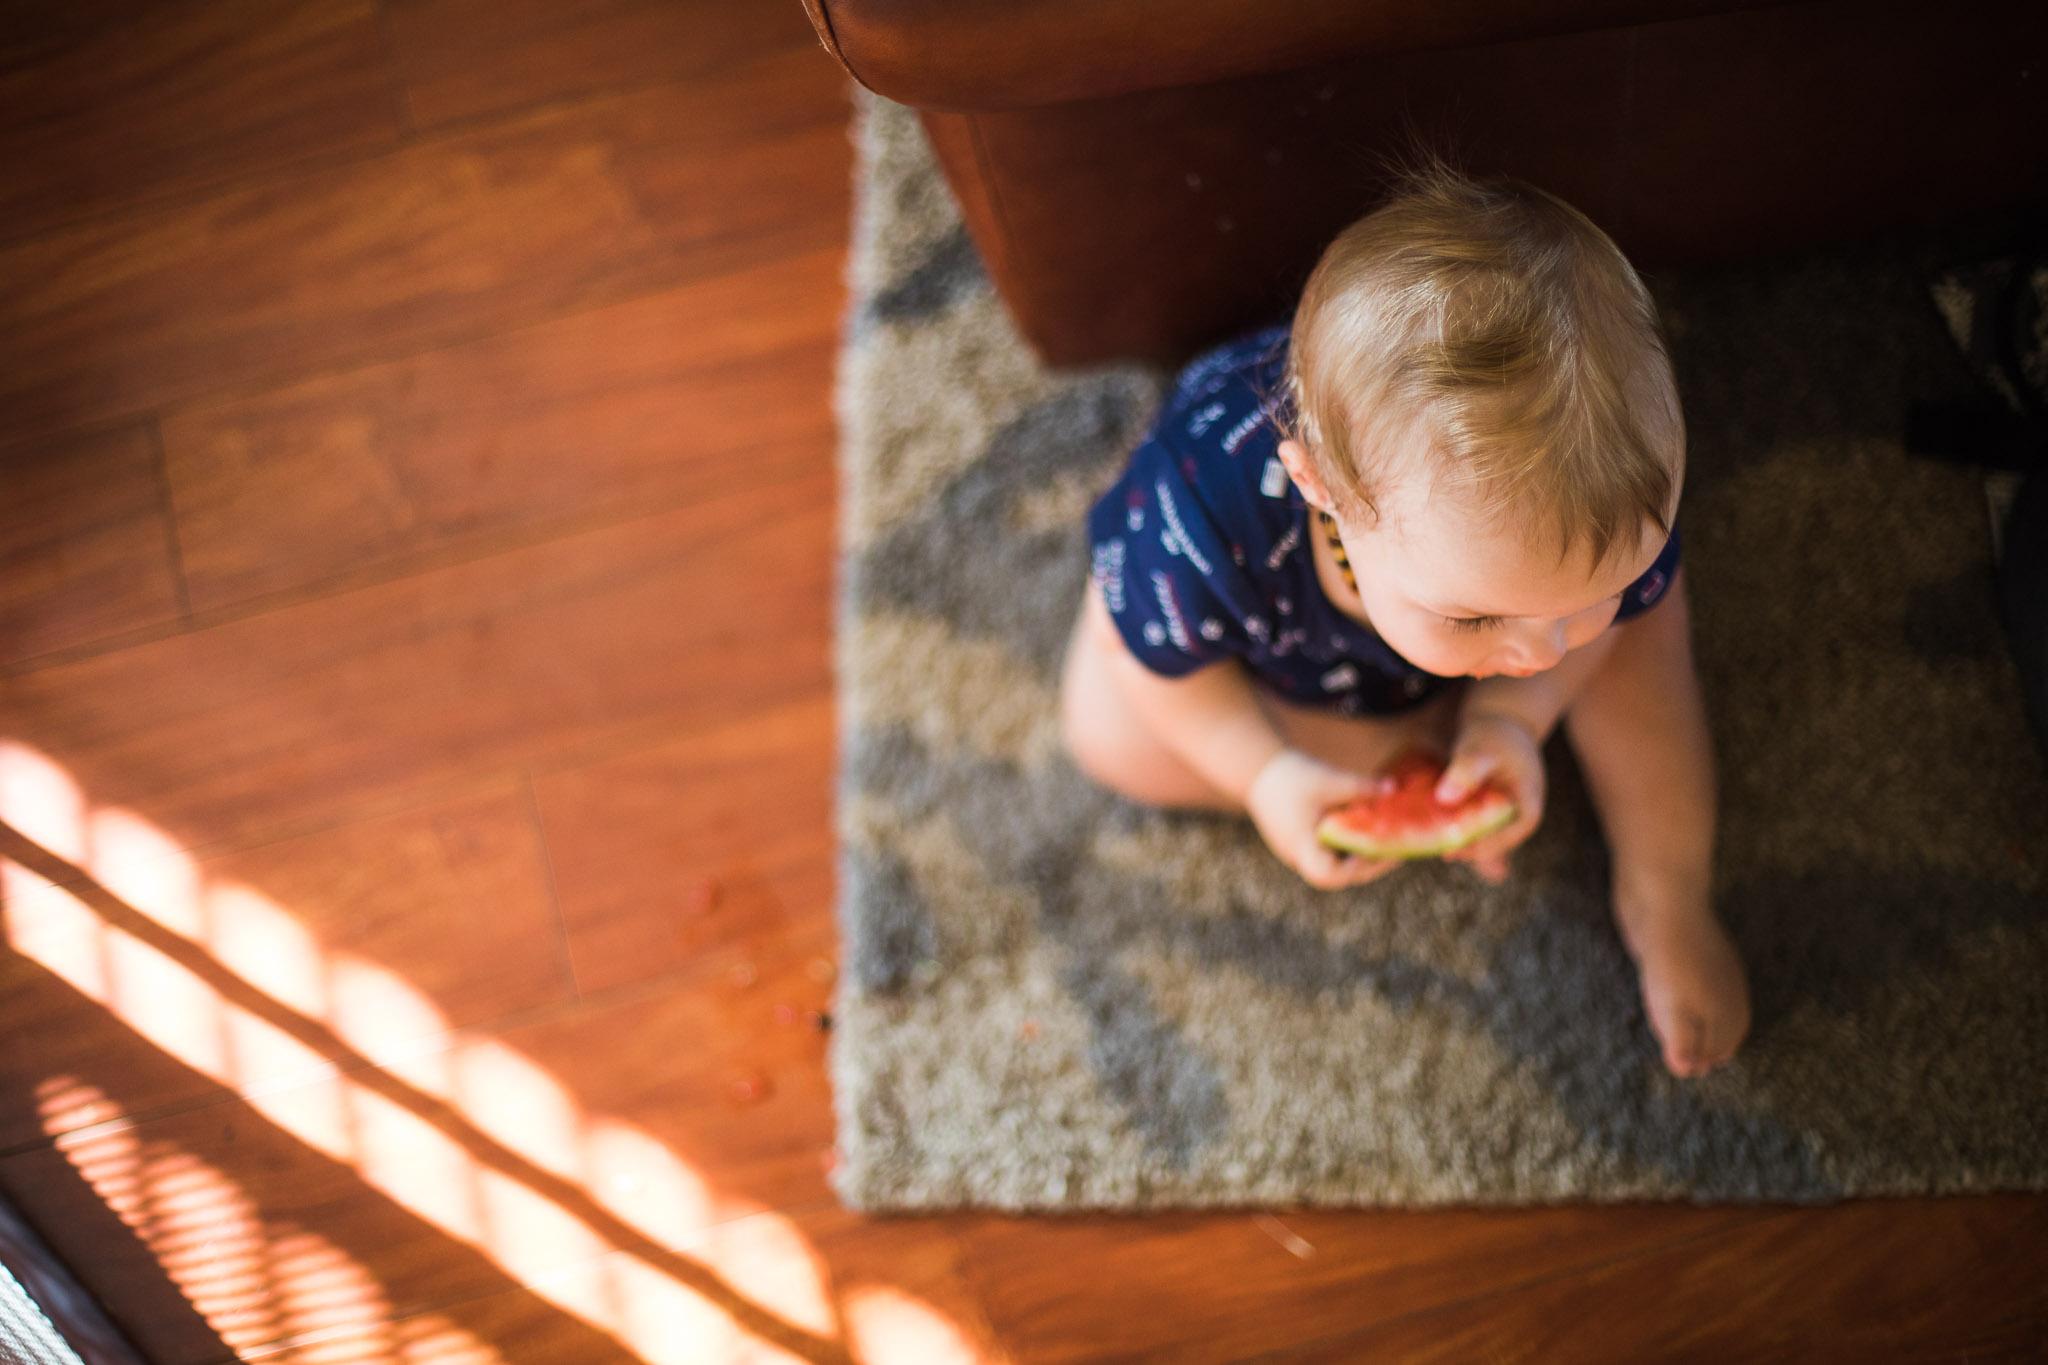 Archer_Inspired_Photography_Watermelon_Baby_Boy_Eating_Lifestyle_Photographer_California-34.jpg